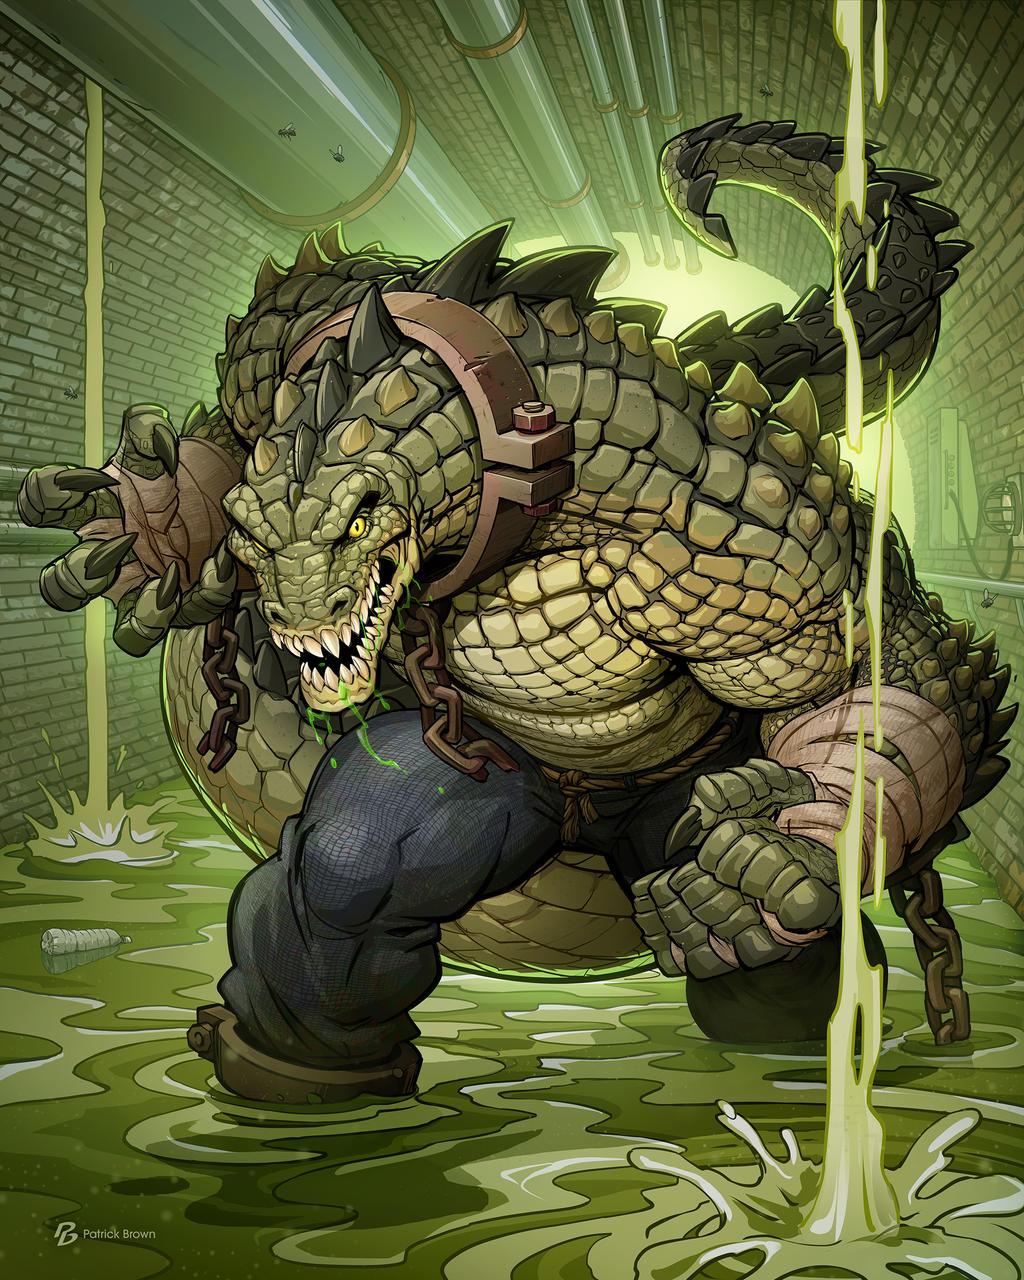 [Image: killer_croc_by_patrickbrown_de8tv3t-full...SBBVM0QLj8]